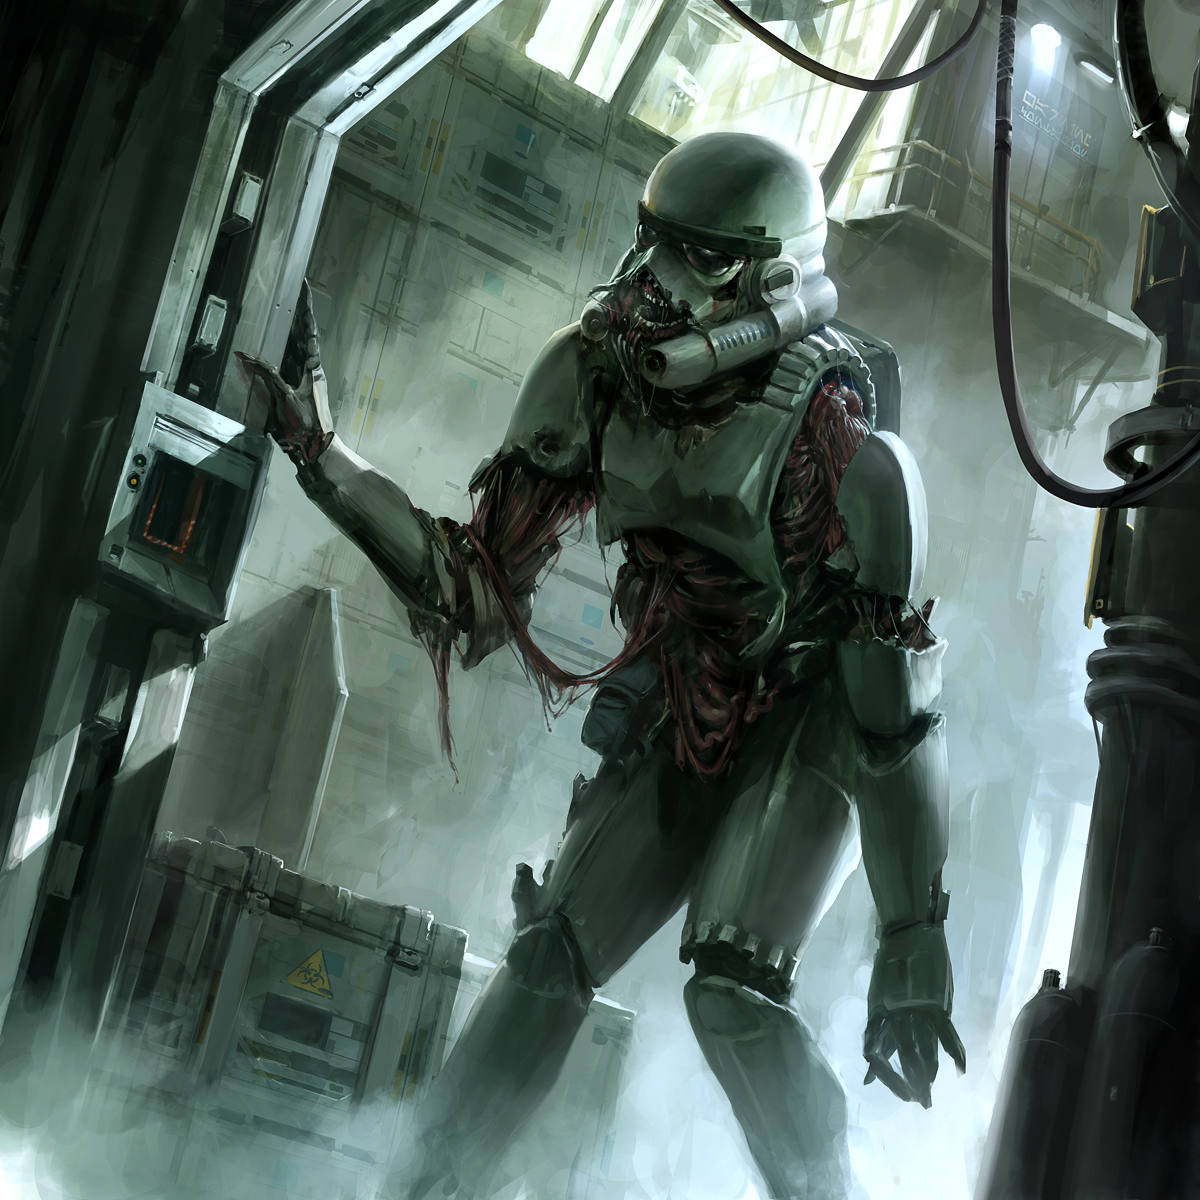 Star Wars Galaxies Death Troopers Litlesiteidaho S Diary